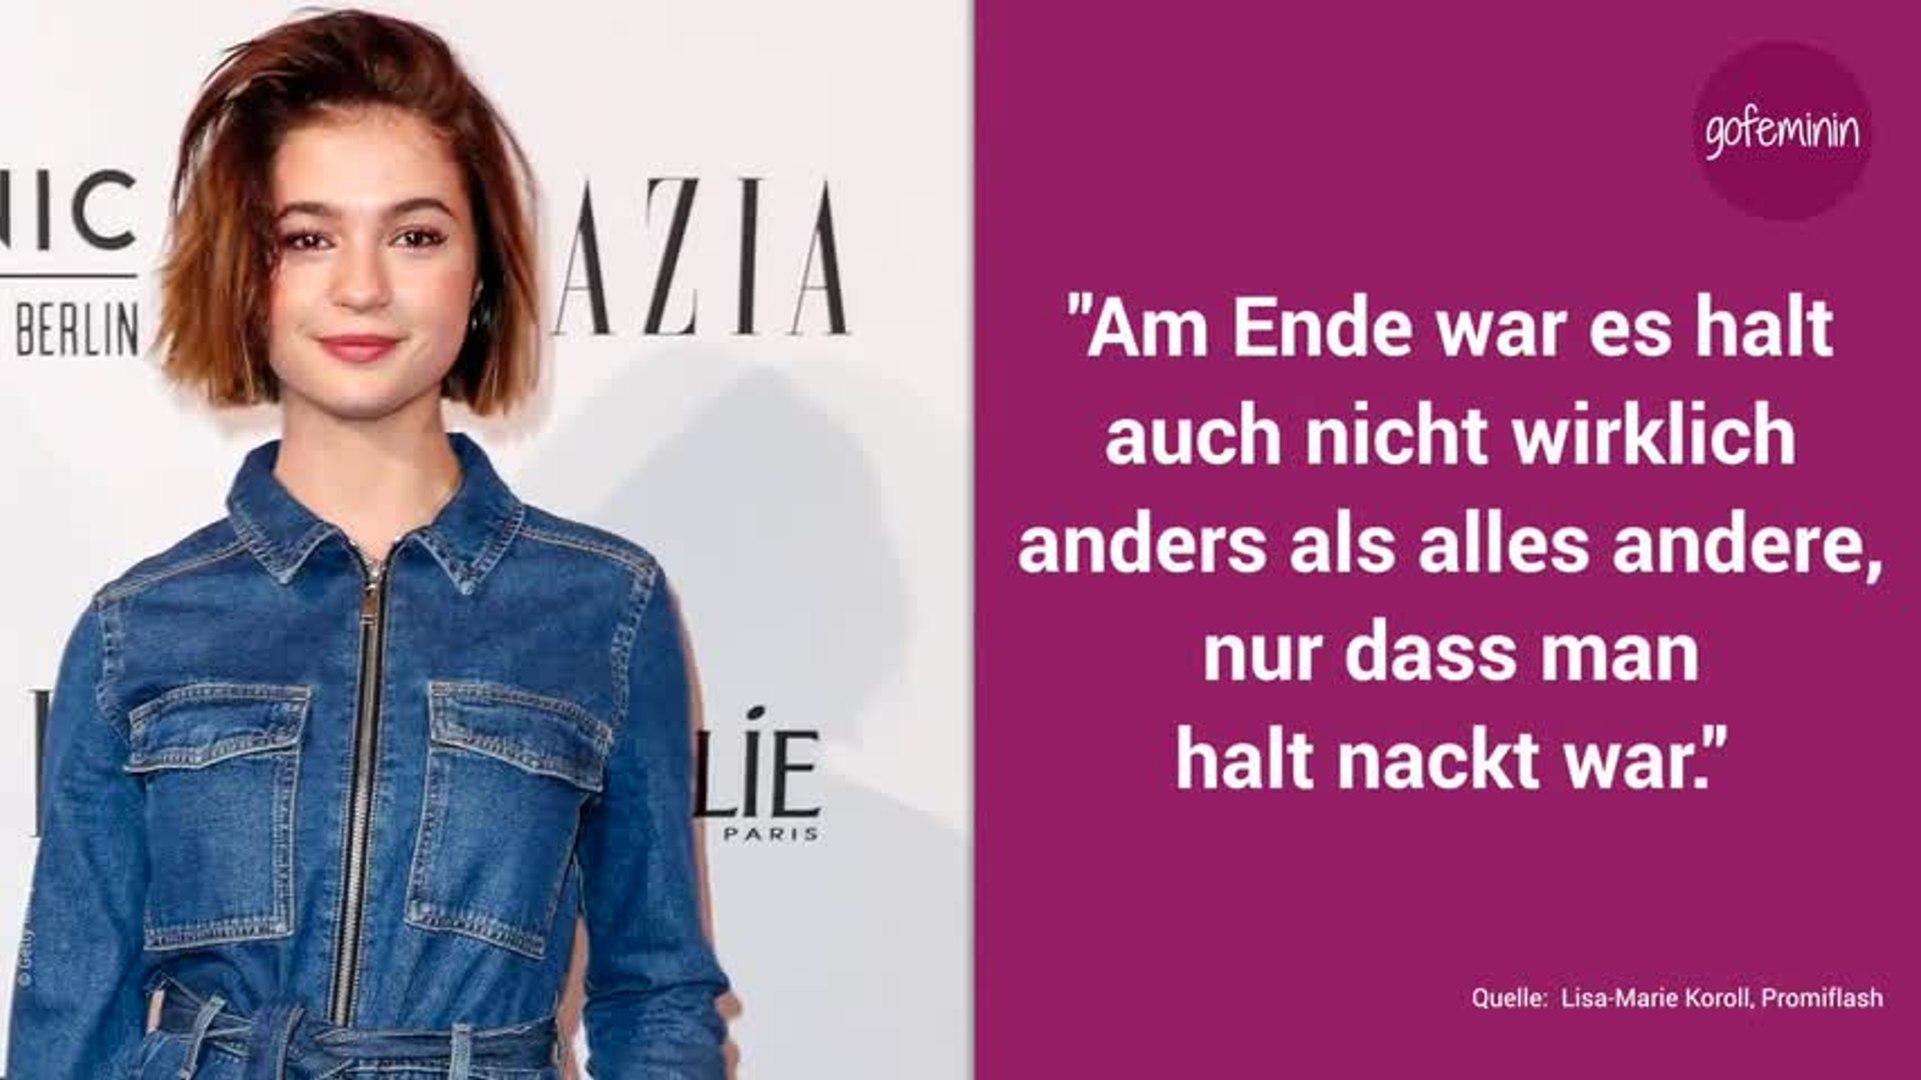 Lisa-Marie nackt Koroll Lina Larissa